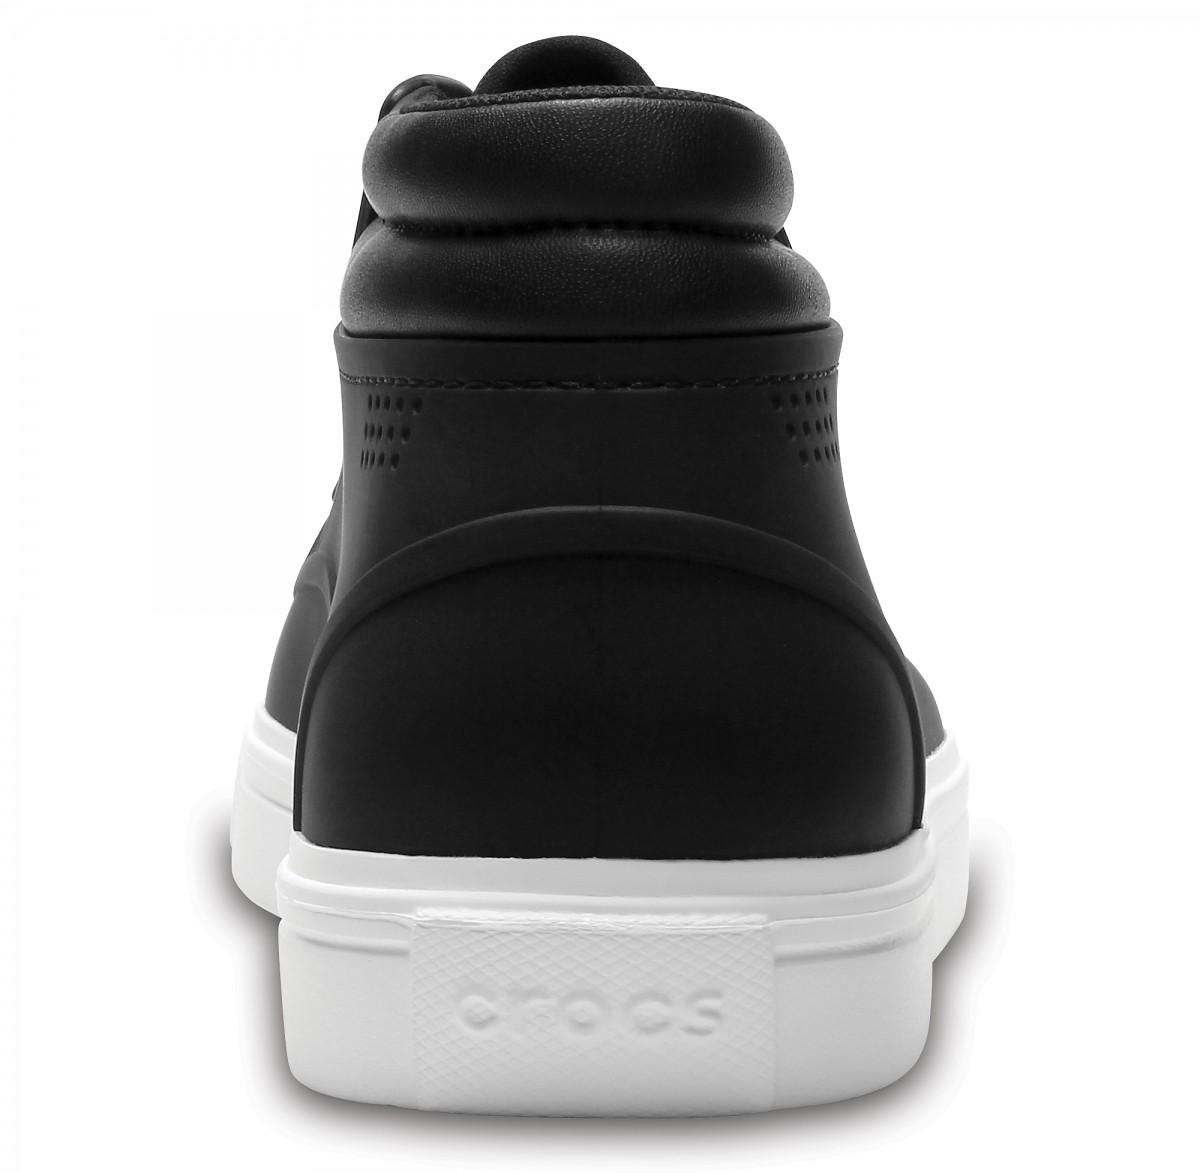 Pánské kotníkové boty (tenisky) Crocs CitiLane Roka Chukka - Black ... ef61513a18